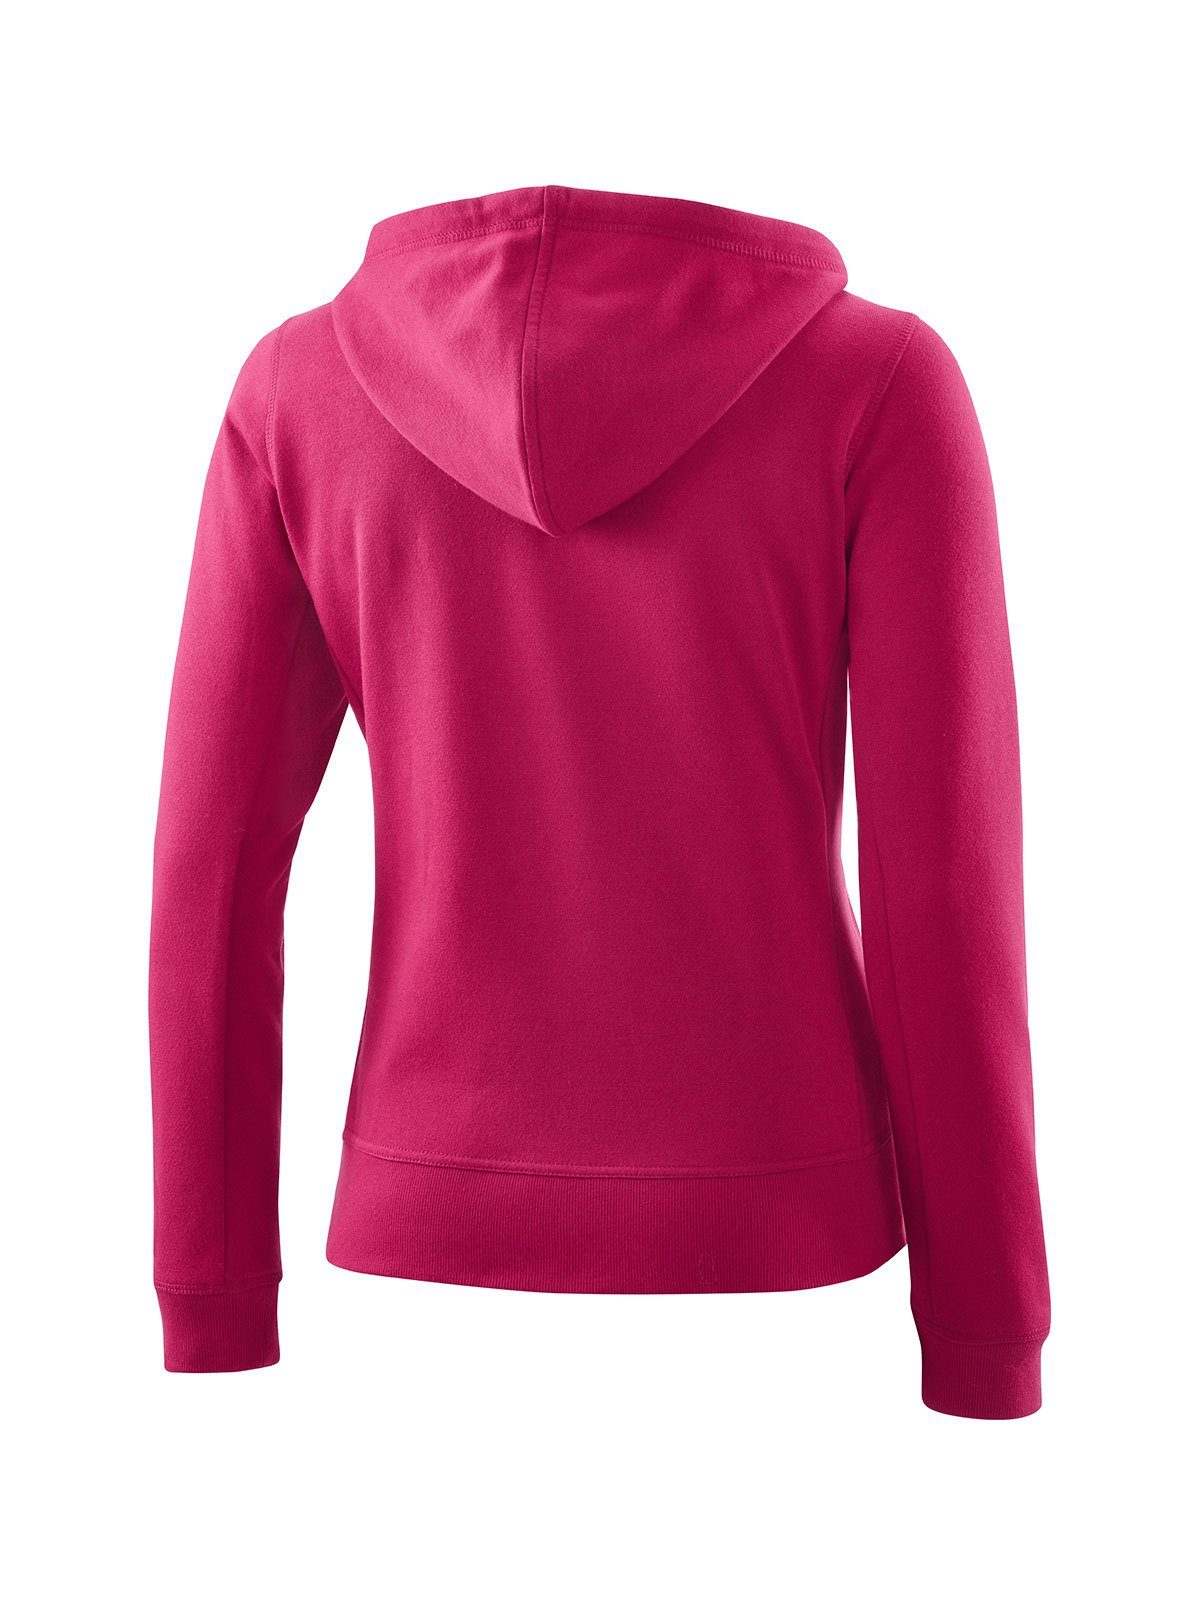 Joy Sportswear Kapuzenfleecejacke KOLINA   Sportbekleidung > Sportjacken > Fleecejacken   Rosa   Joy Sportswear